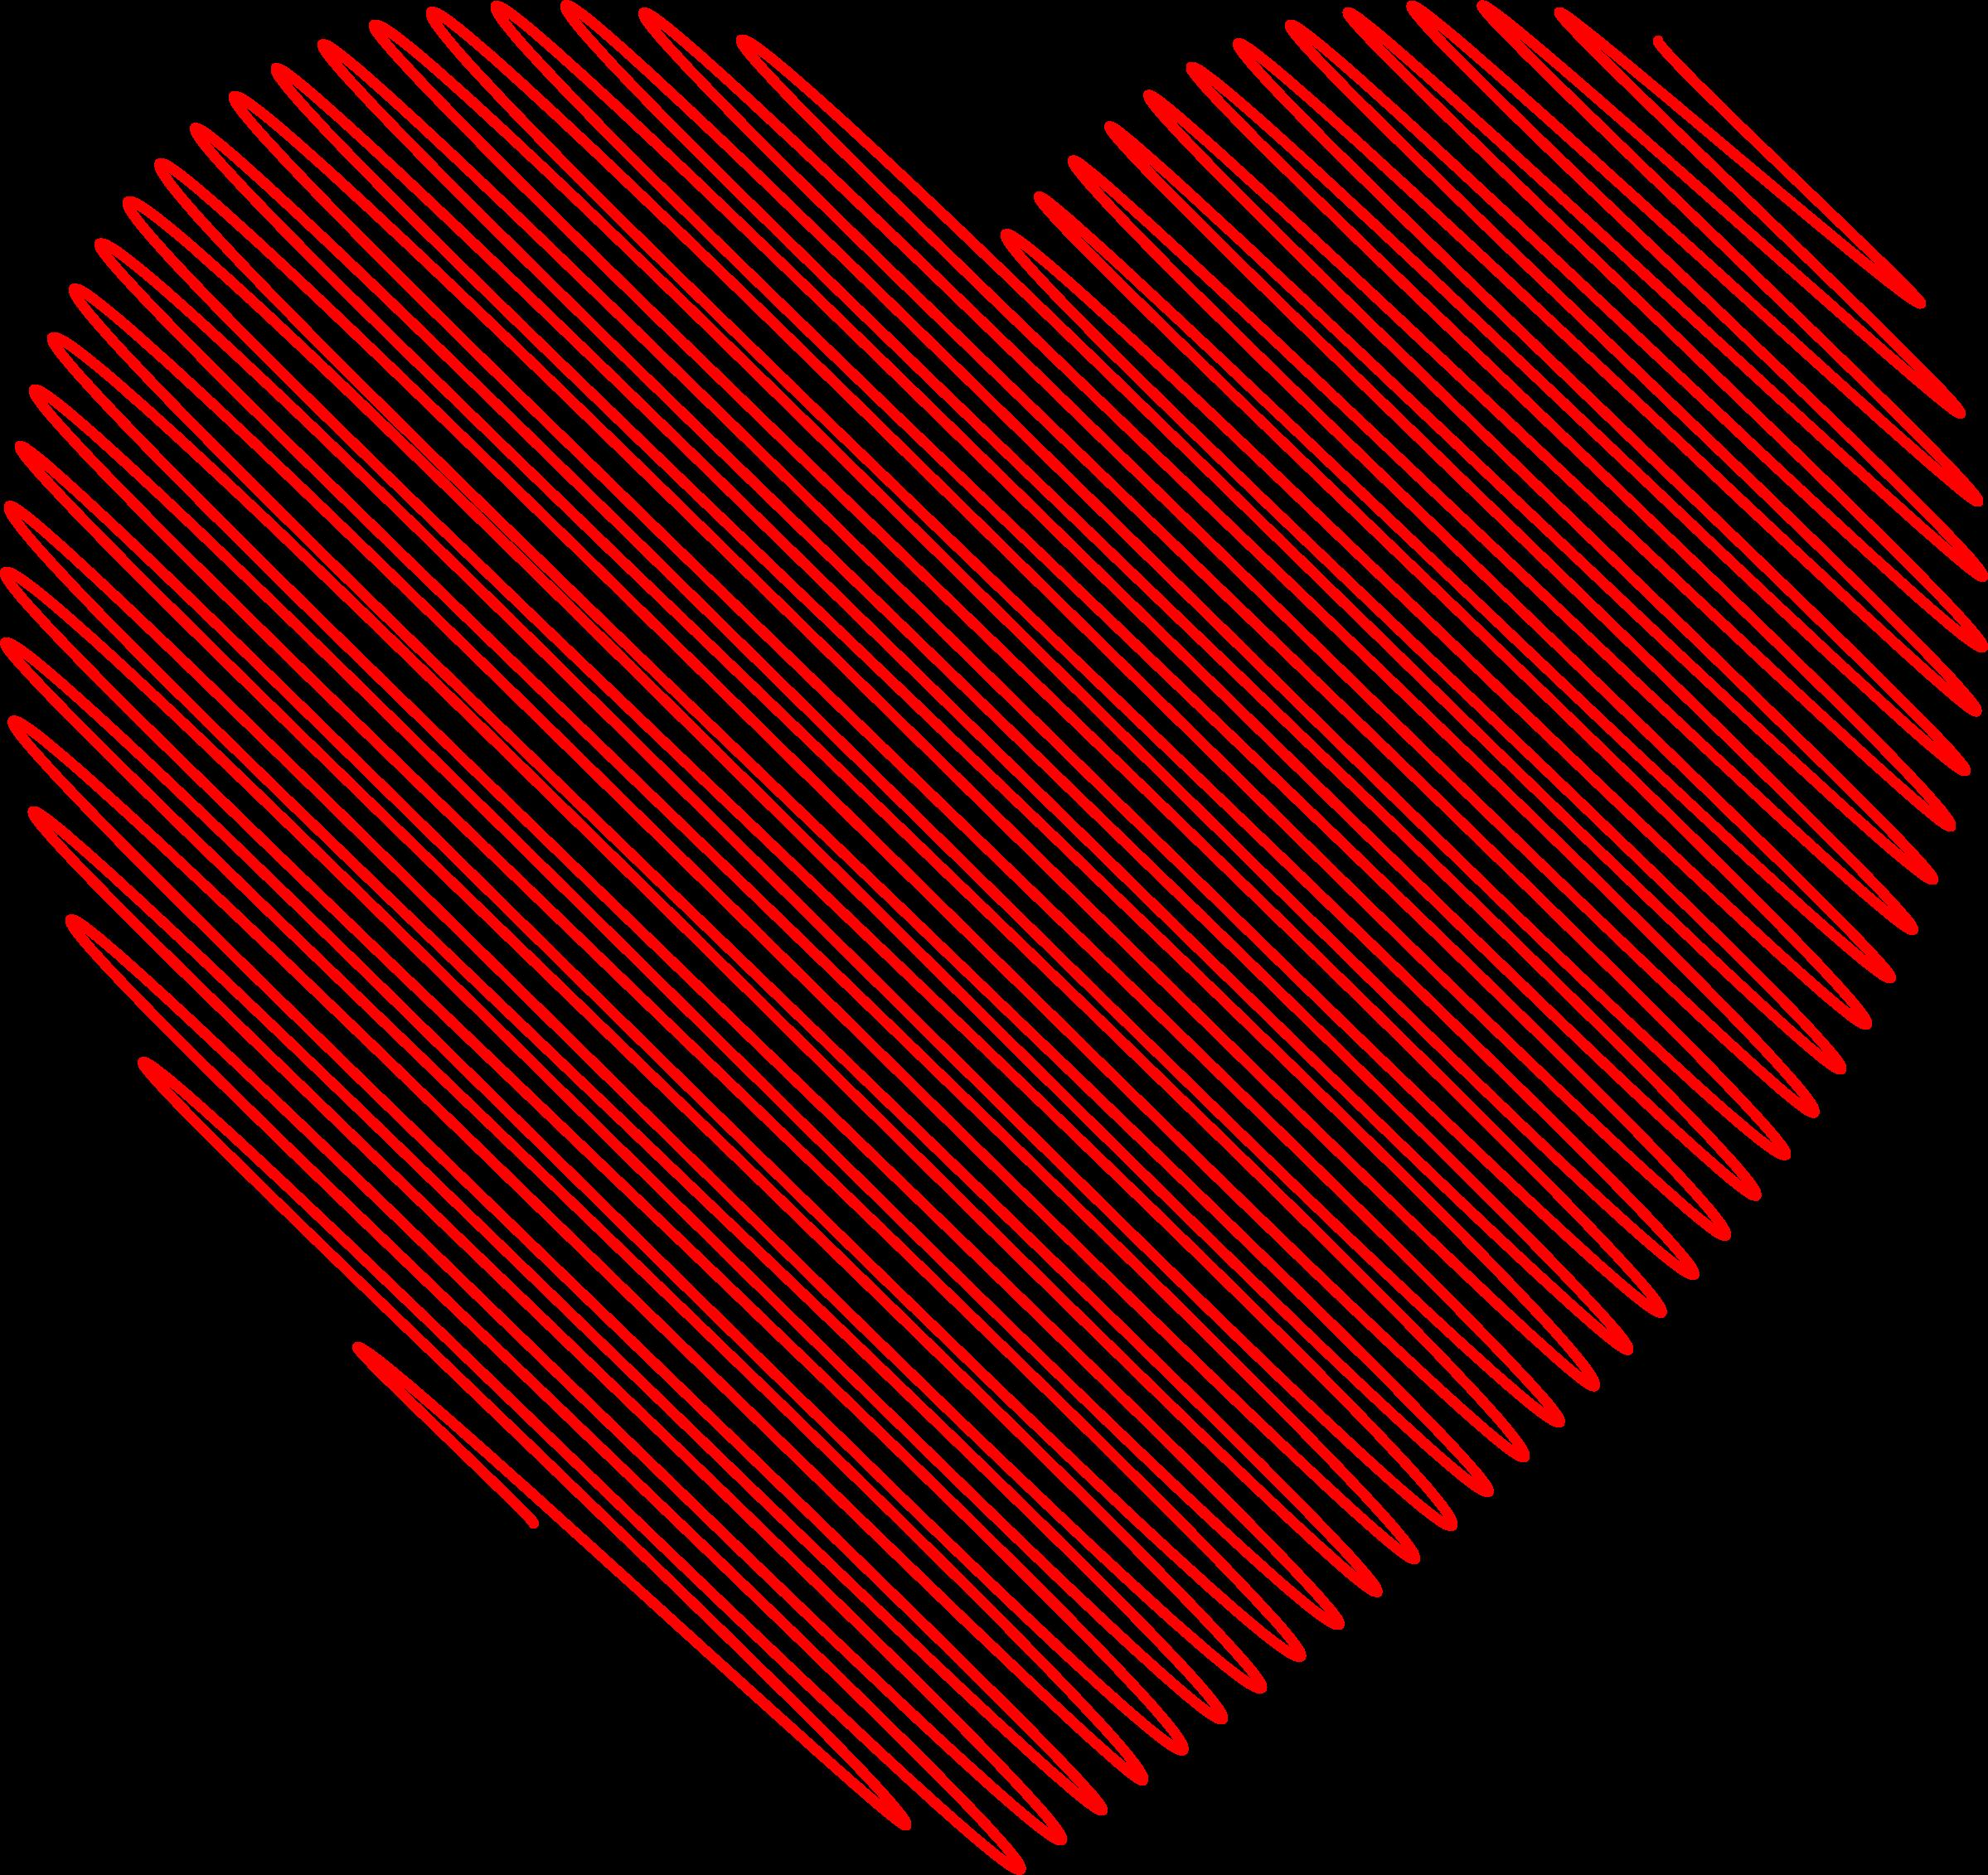 Hearts clipart scribbled Scribble Heart Scribble Clipart Heart